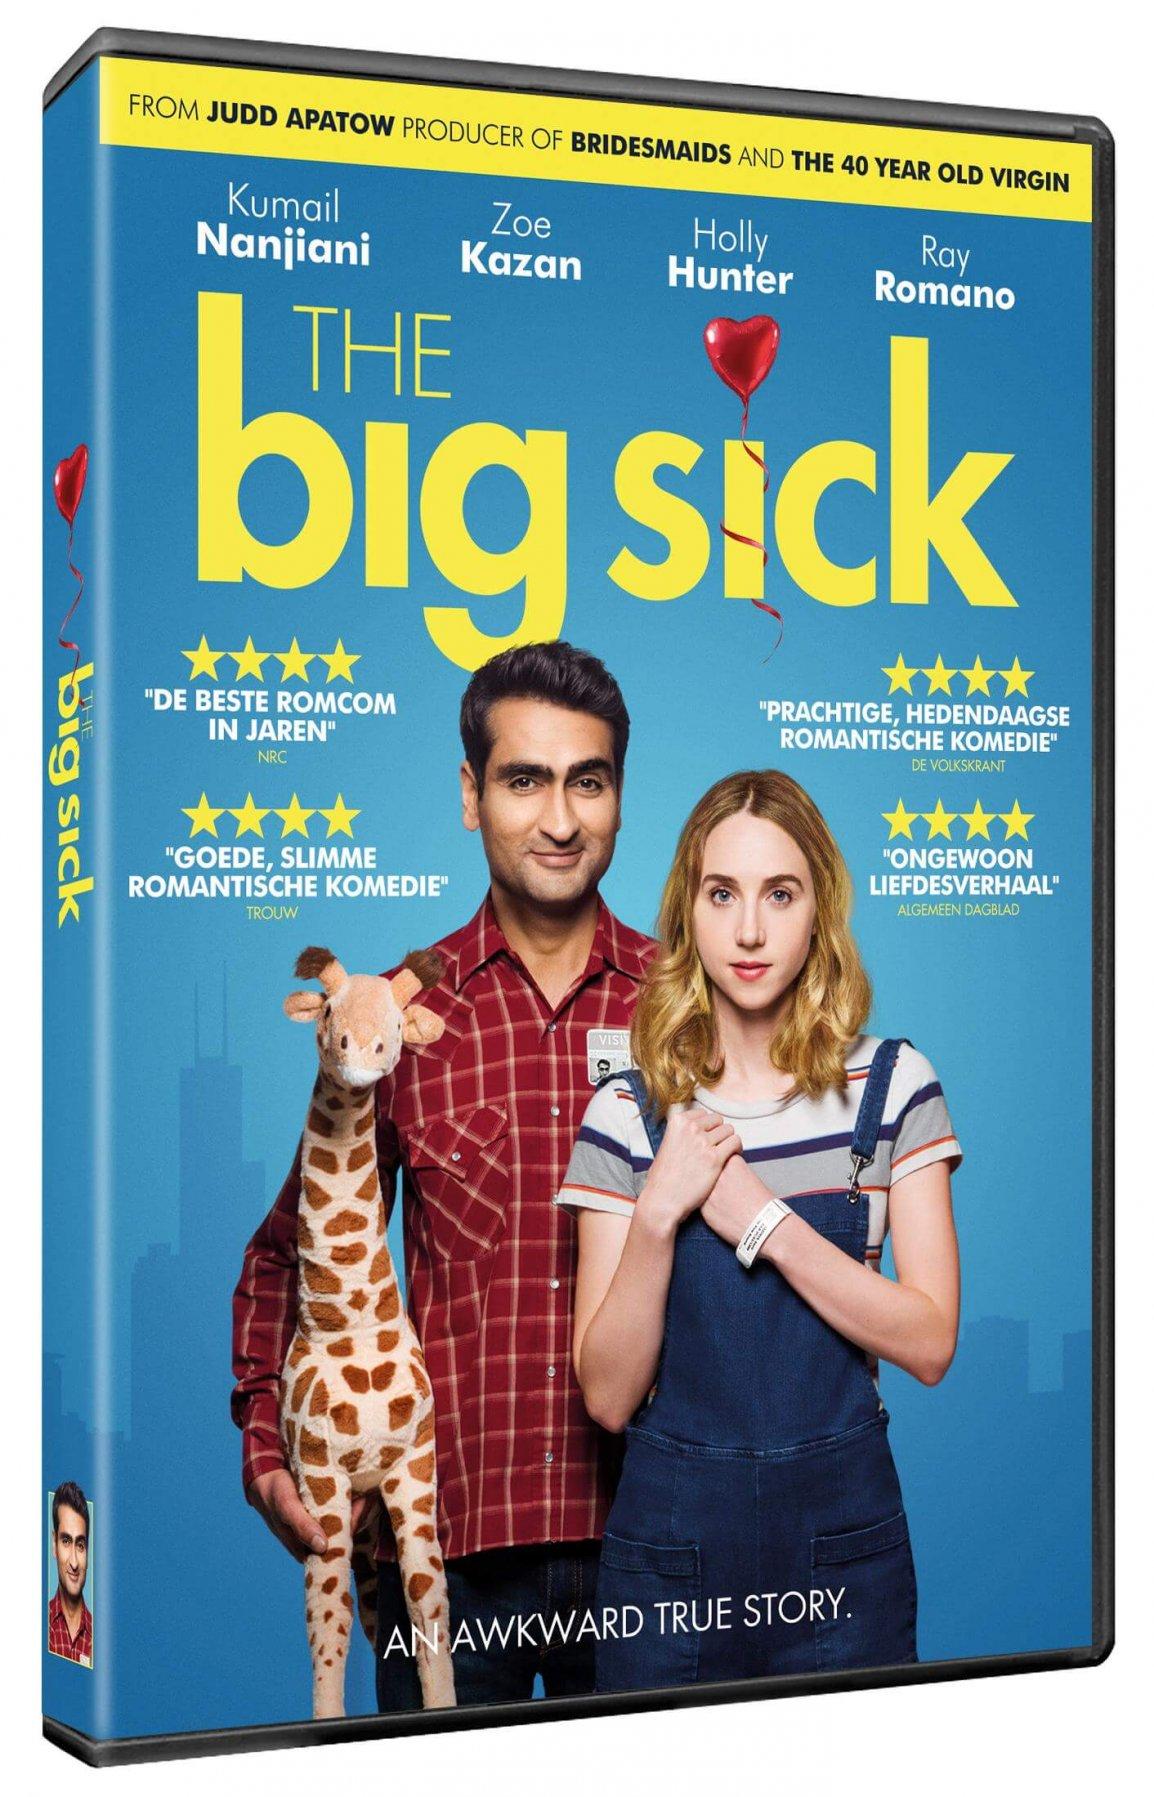 Verjaardag Giveaway #6 | DVD The Big Sick